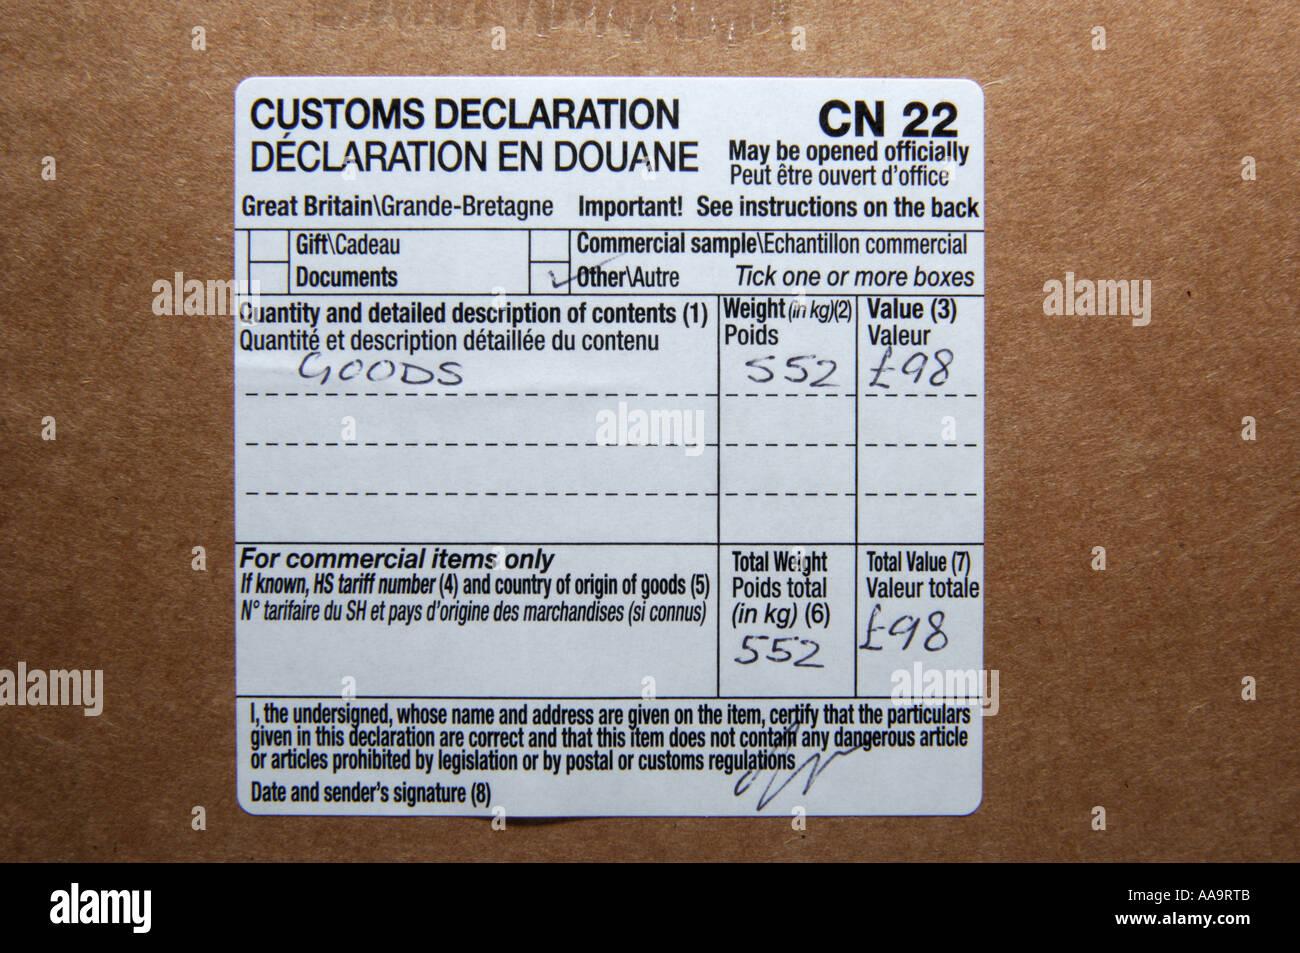 Close up of a customs declaration label on a parcel stock photo close up of a customs declaration label on a parcel altavistaventures Images